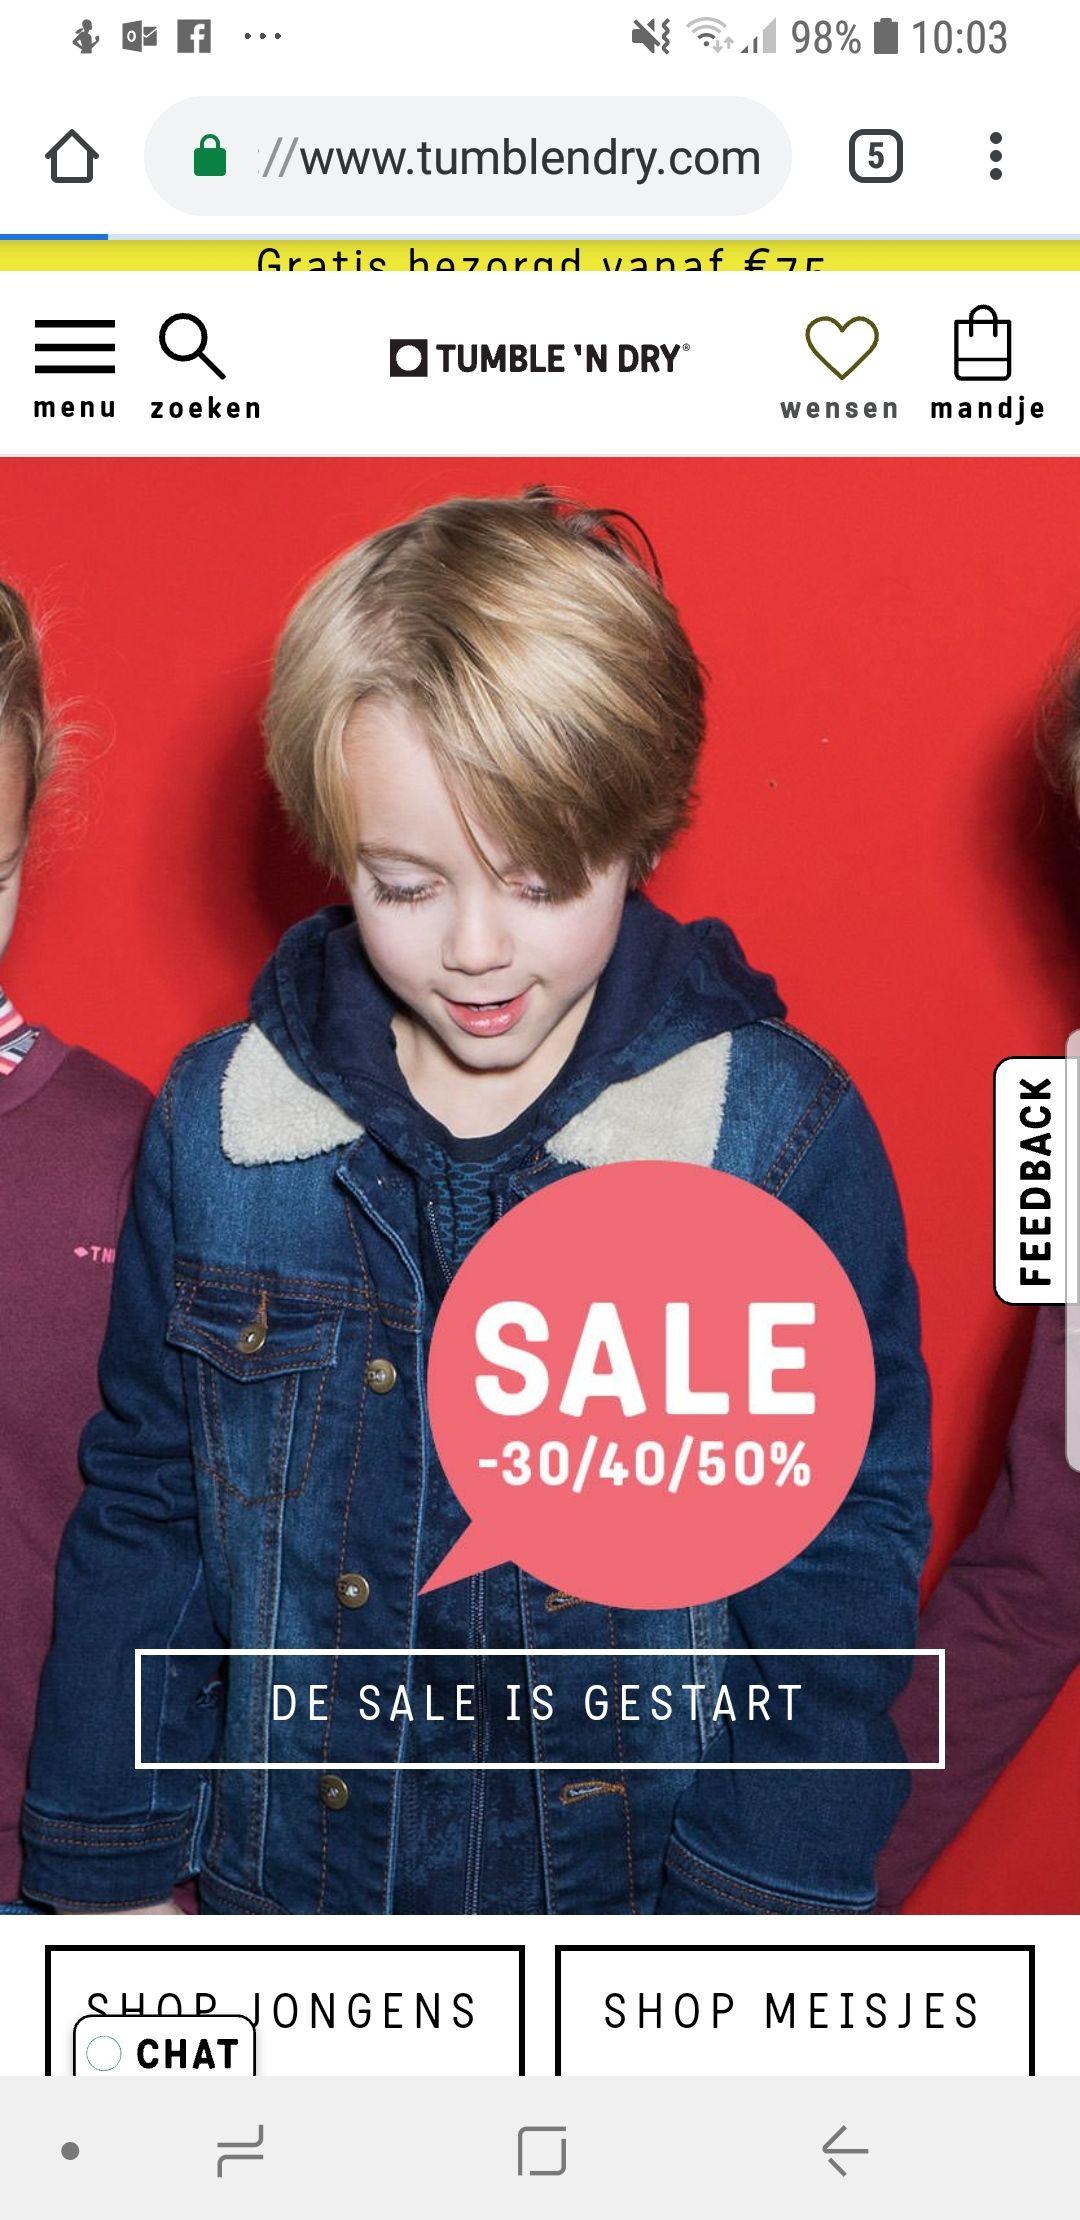 Tumble 'n Dry sale 30/40/50%